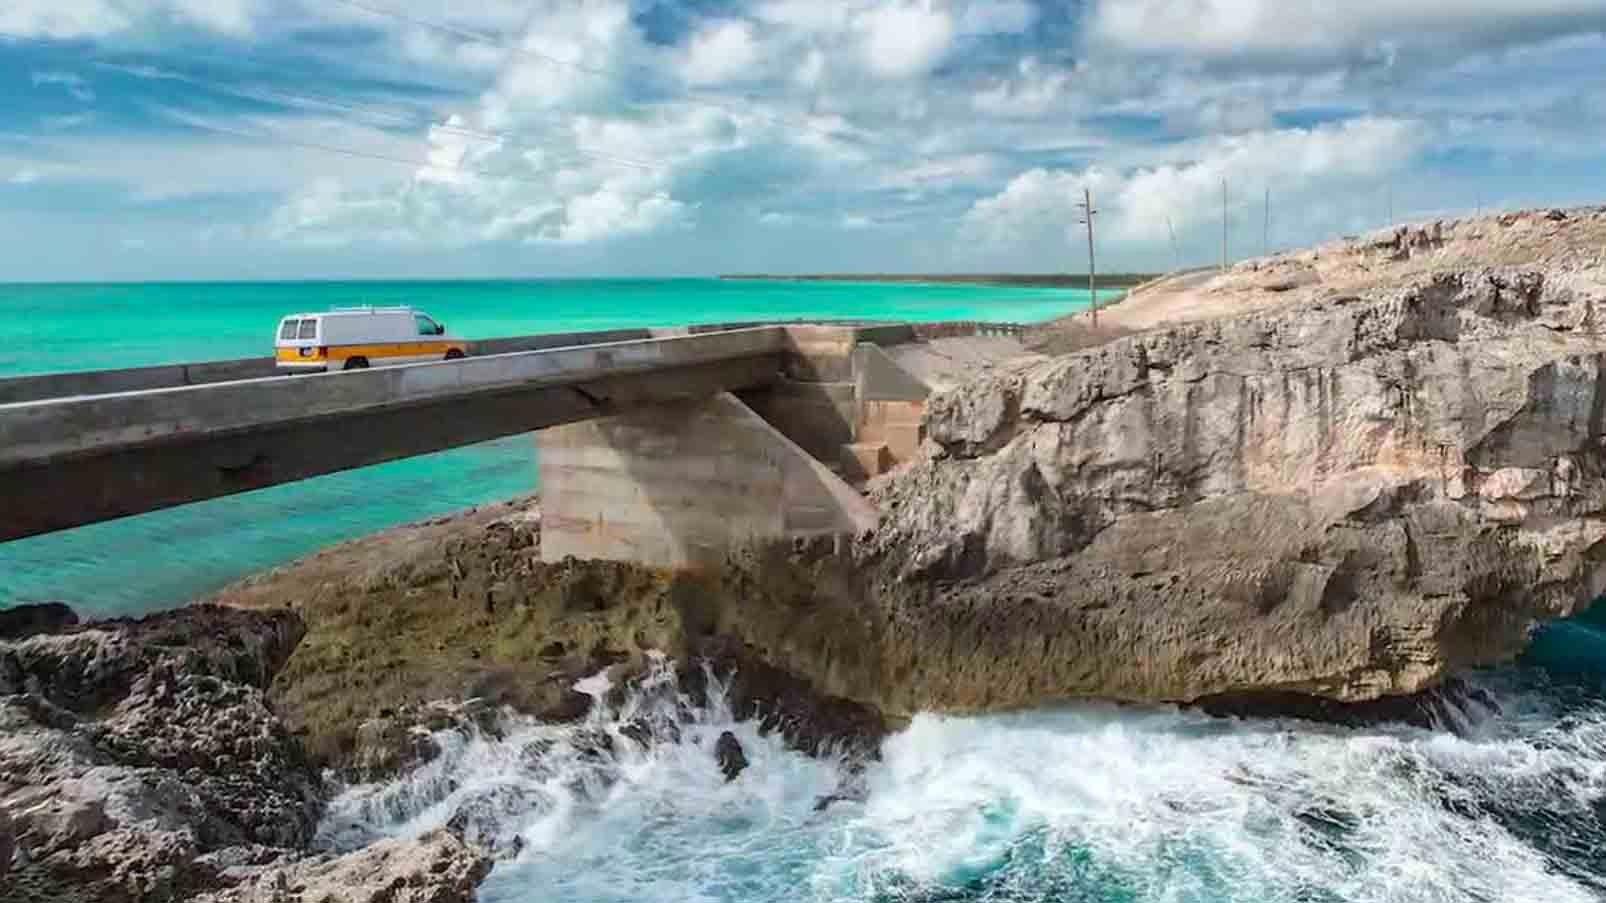 Bahamas Bridge the 'Narrowest Place on Earth'